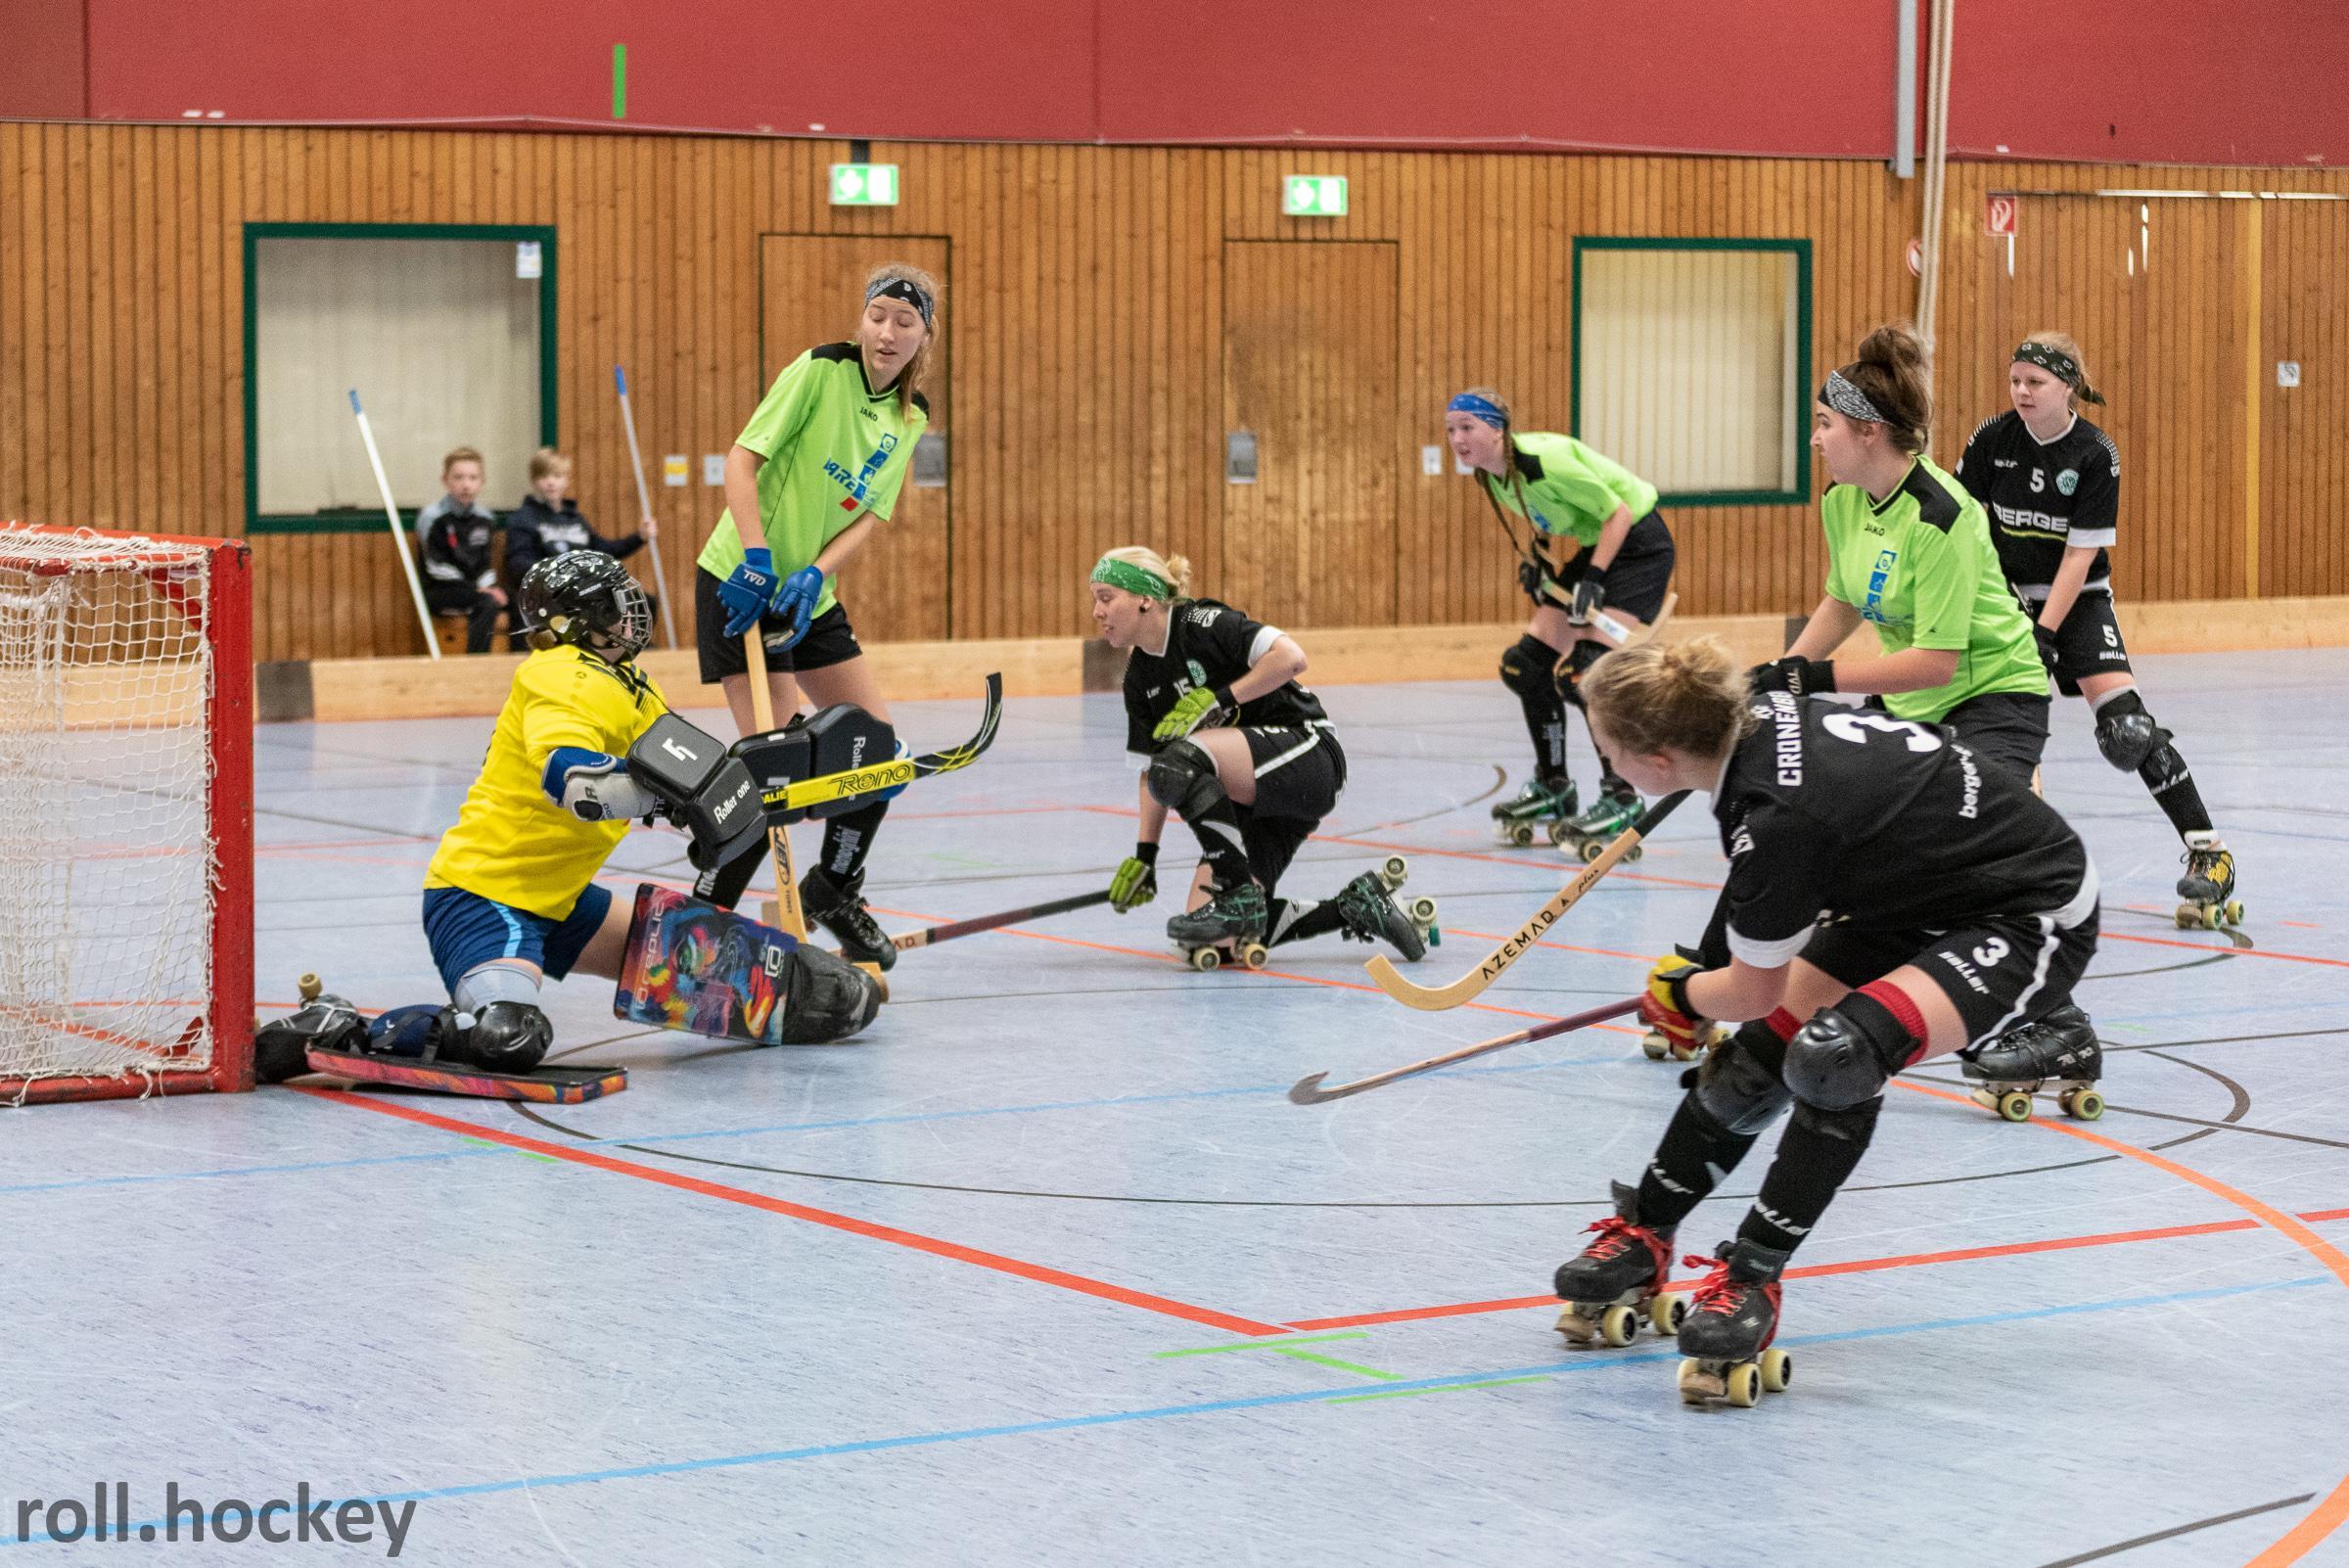 RSC Cronenberg Rollhockey Bundesliga Damen Spieltag 19.01.2019